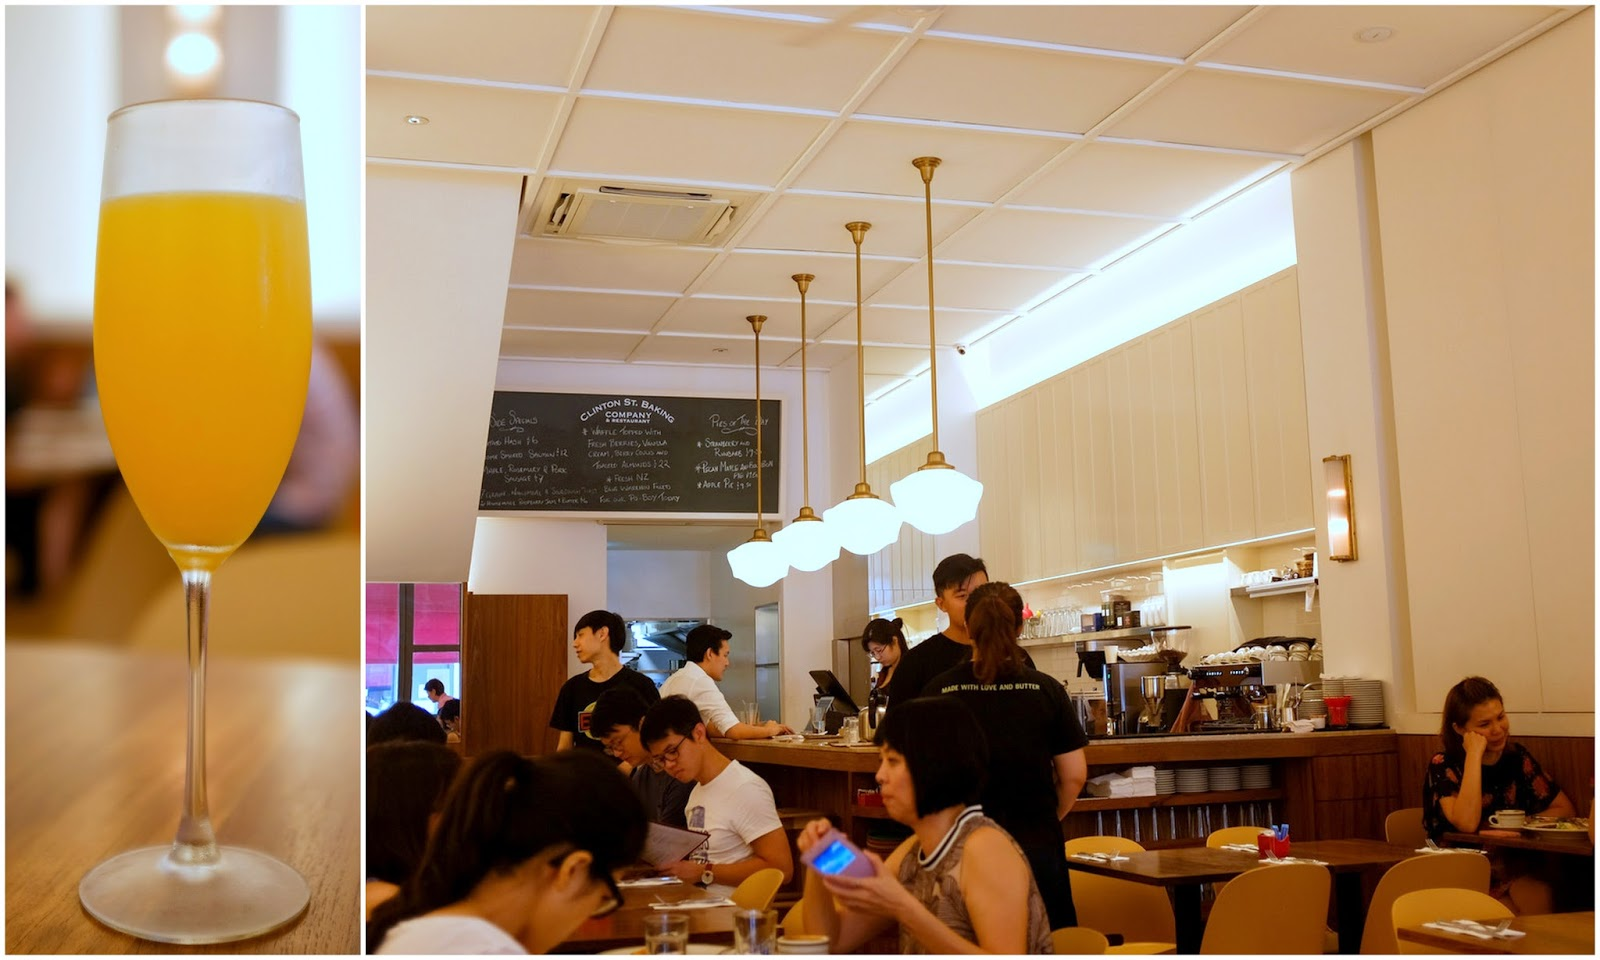 Clinton Bakery Cafe Dubai